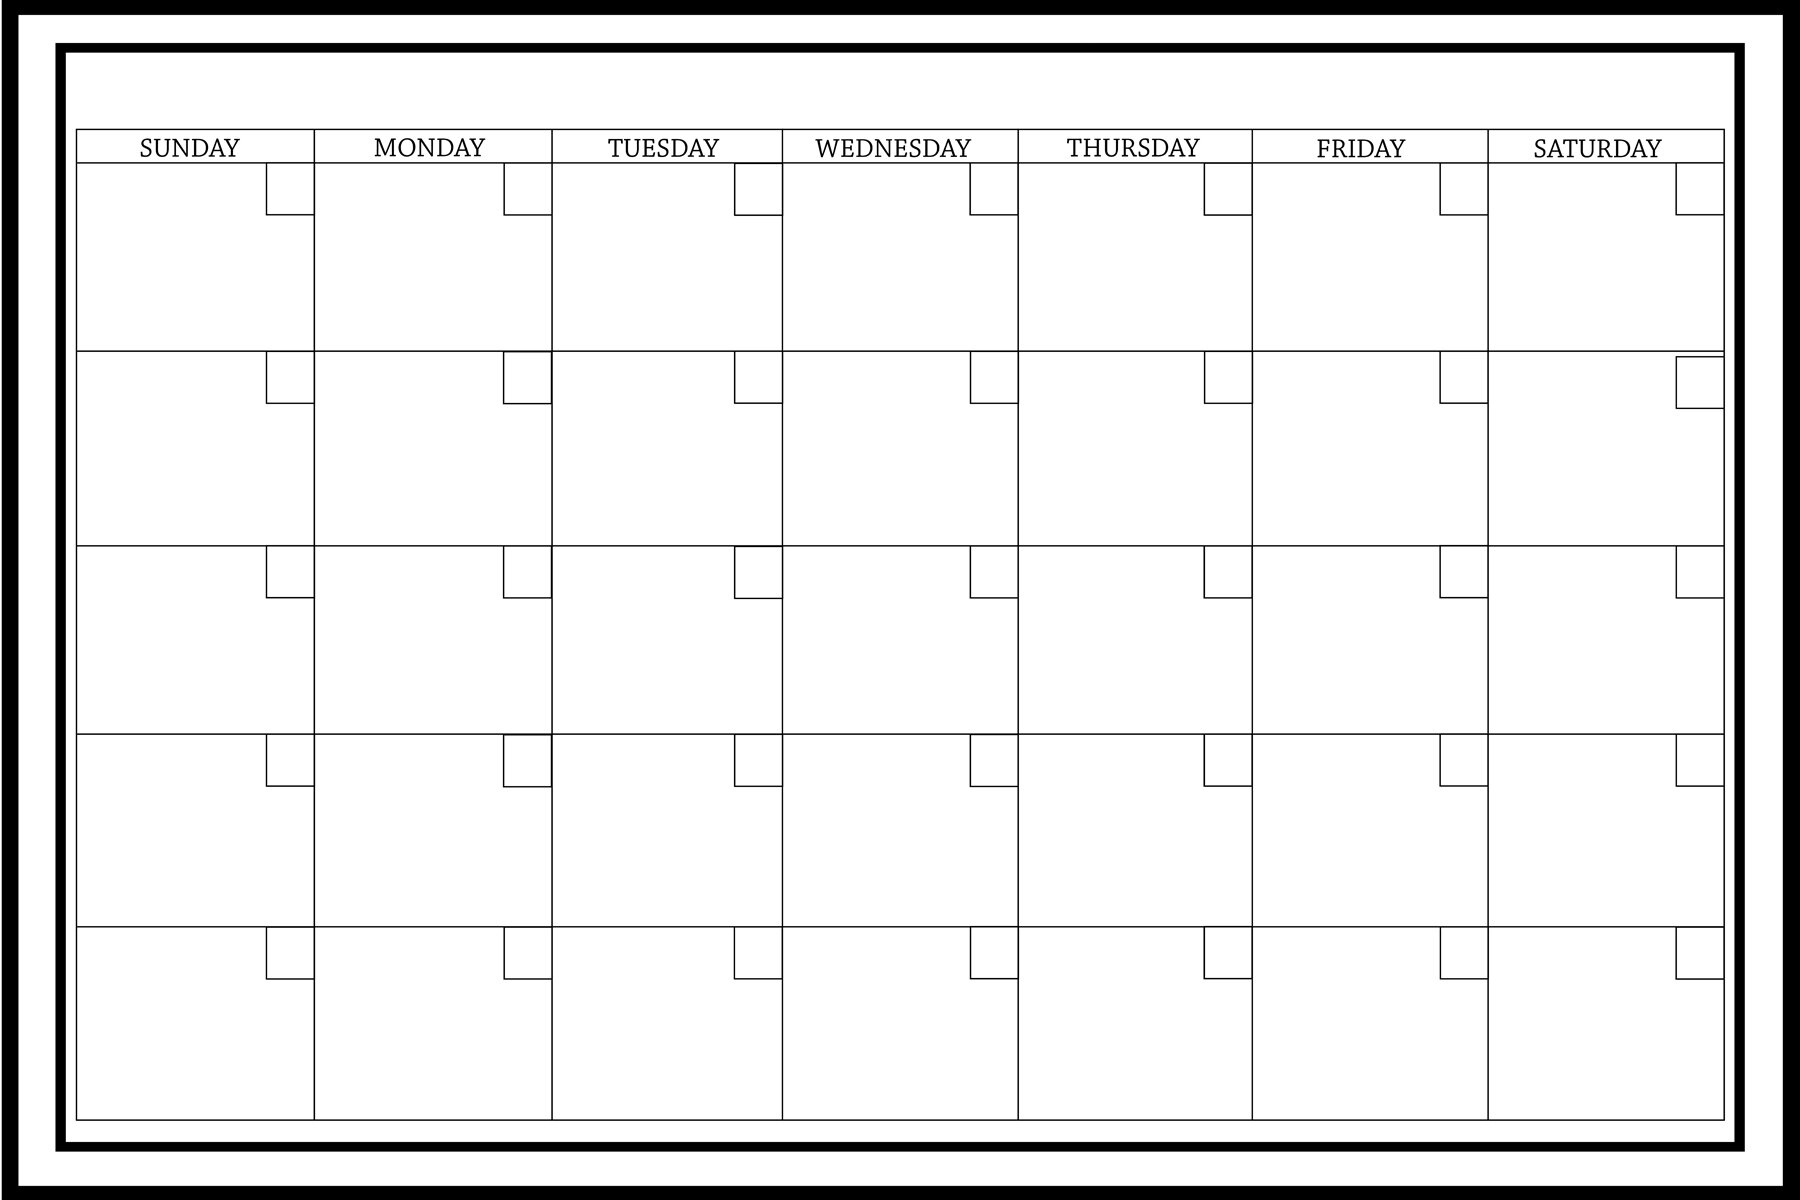 WallPops Calendar Whiteboard Wall Decal